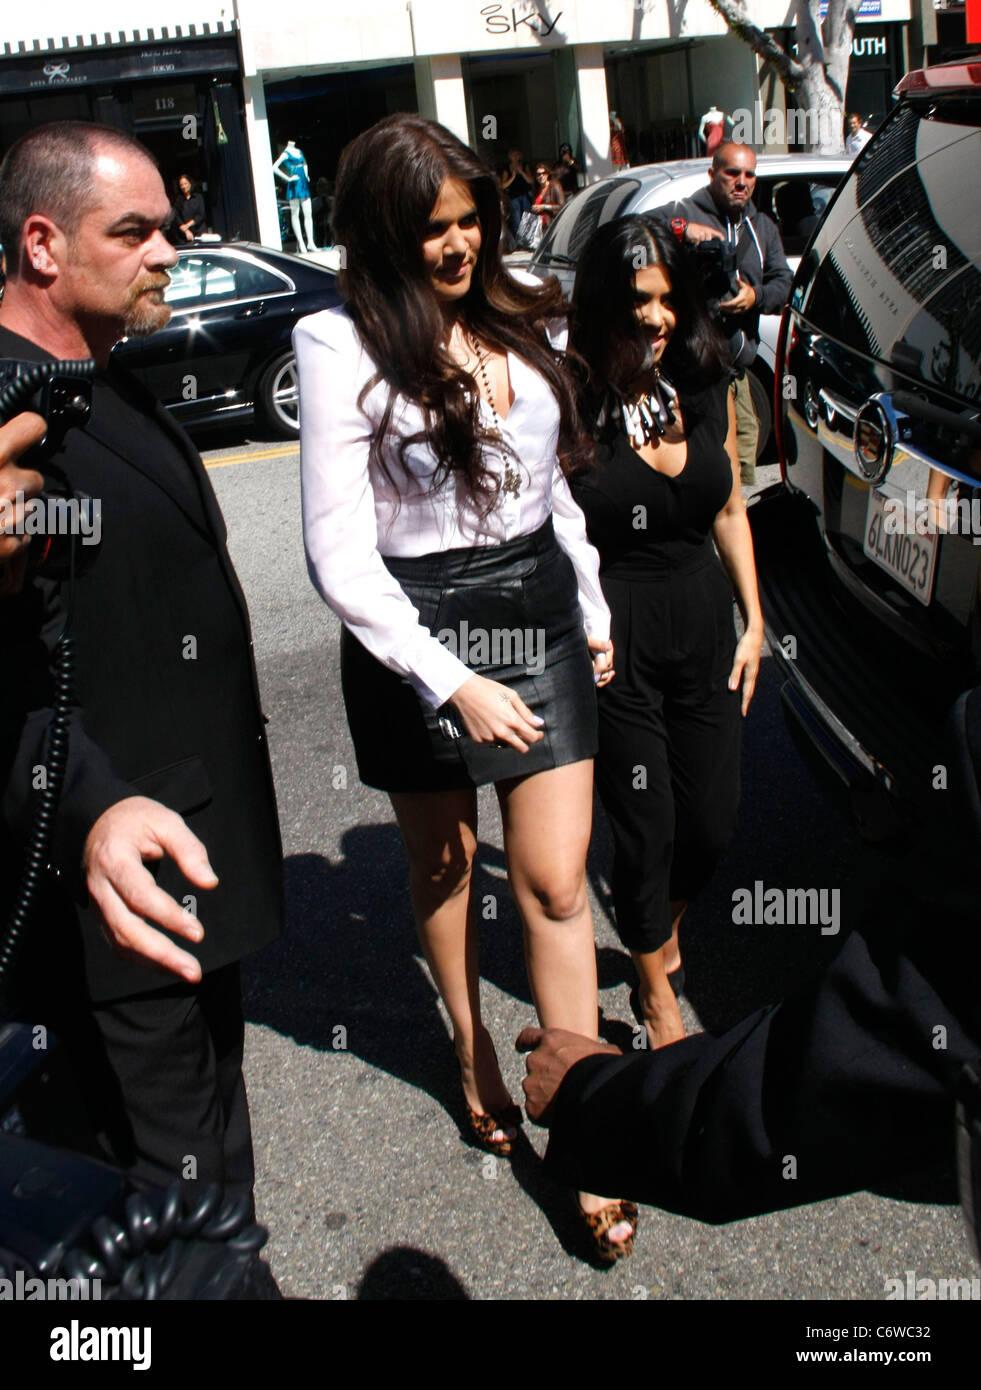 Khloe Kardashian The Kardashians Make A Meet And Greet Appearance At